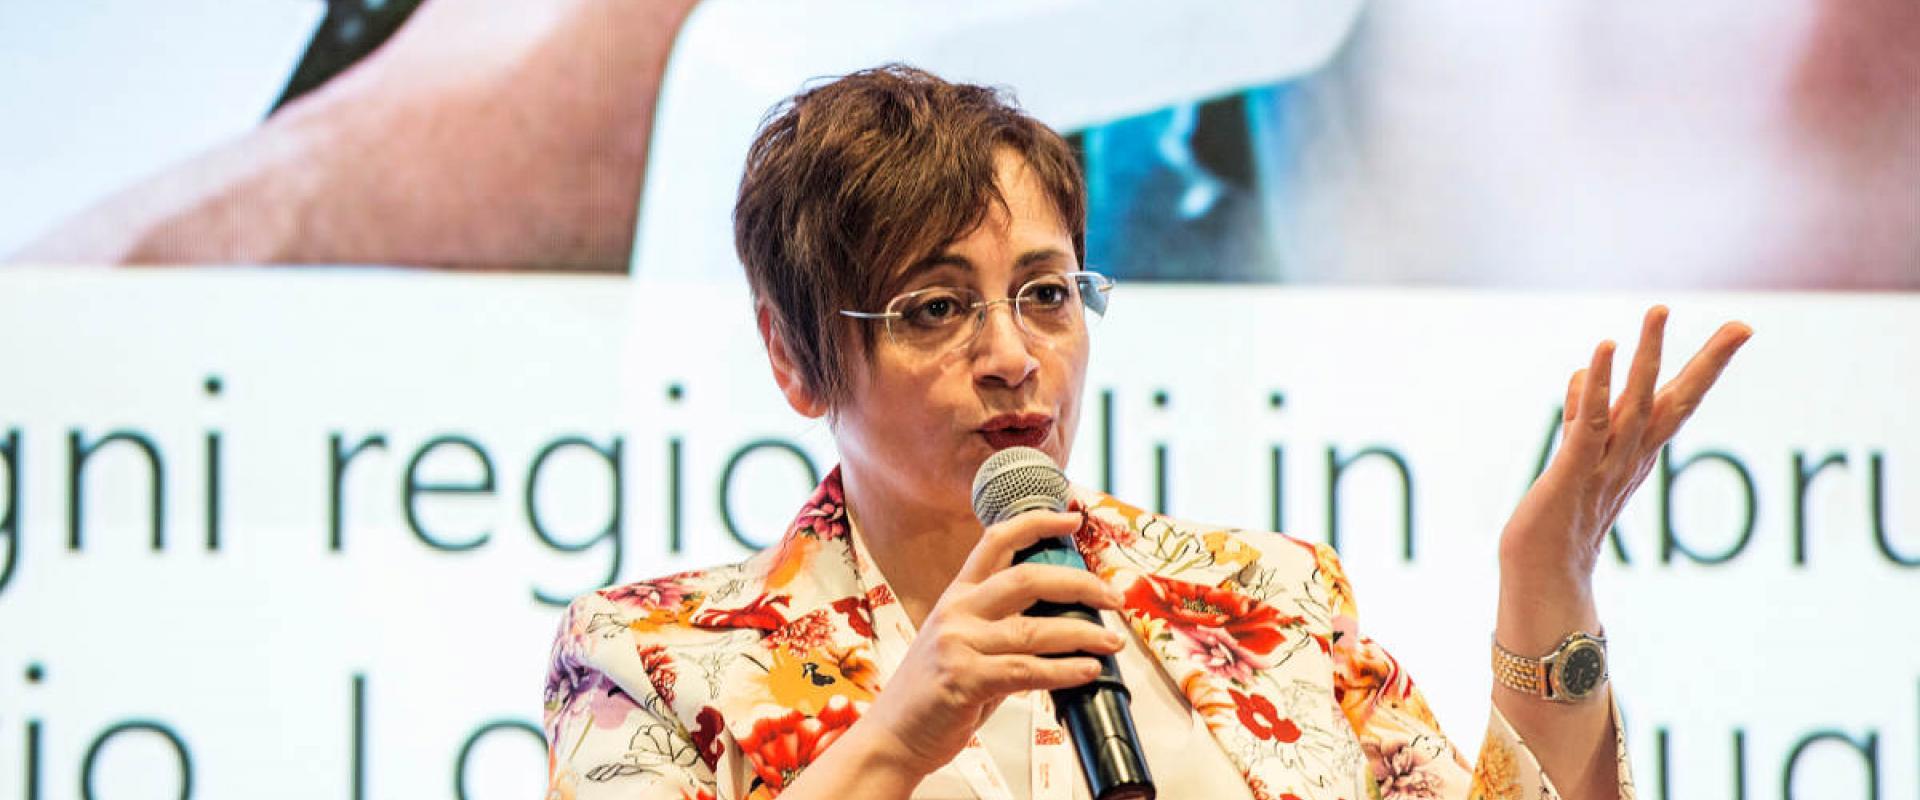 Angela Martino